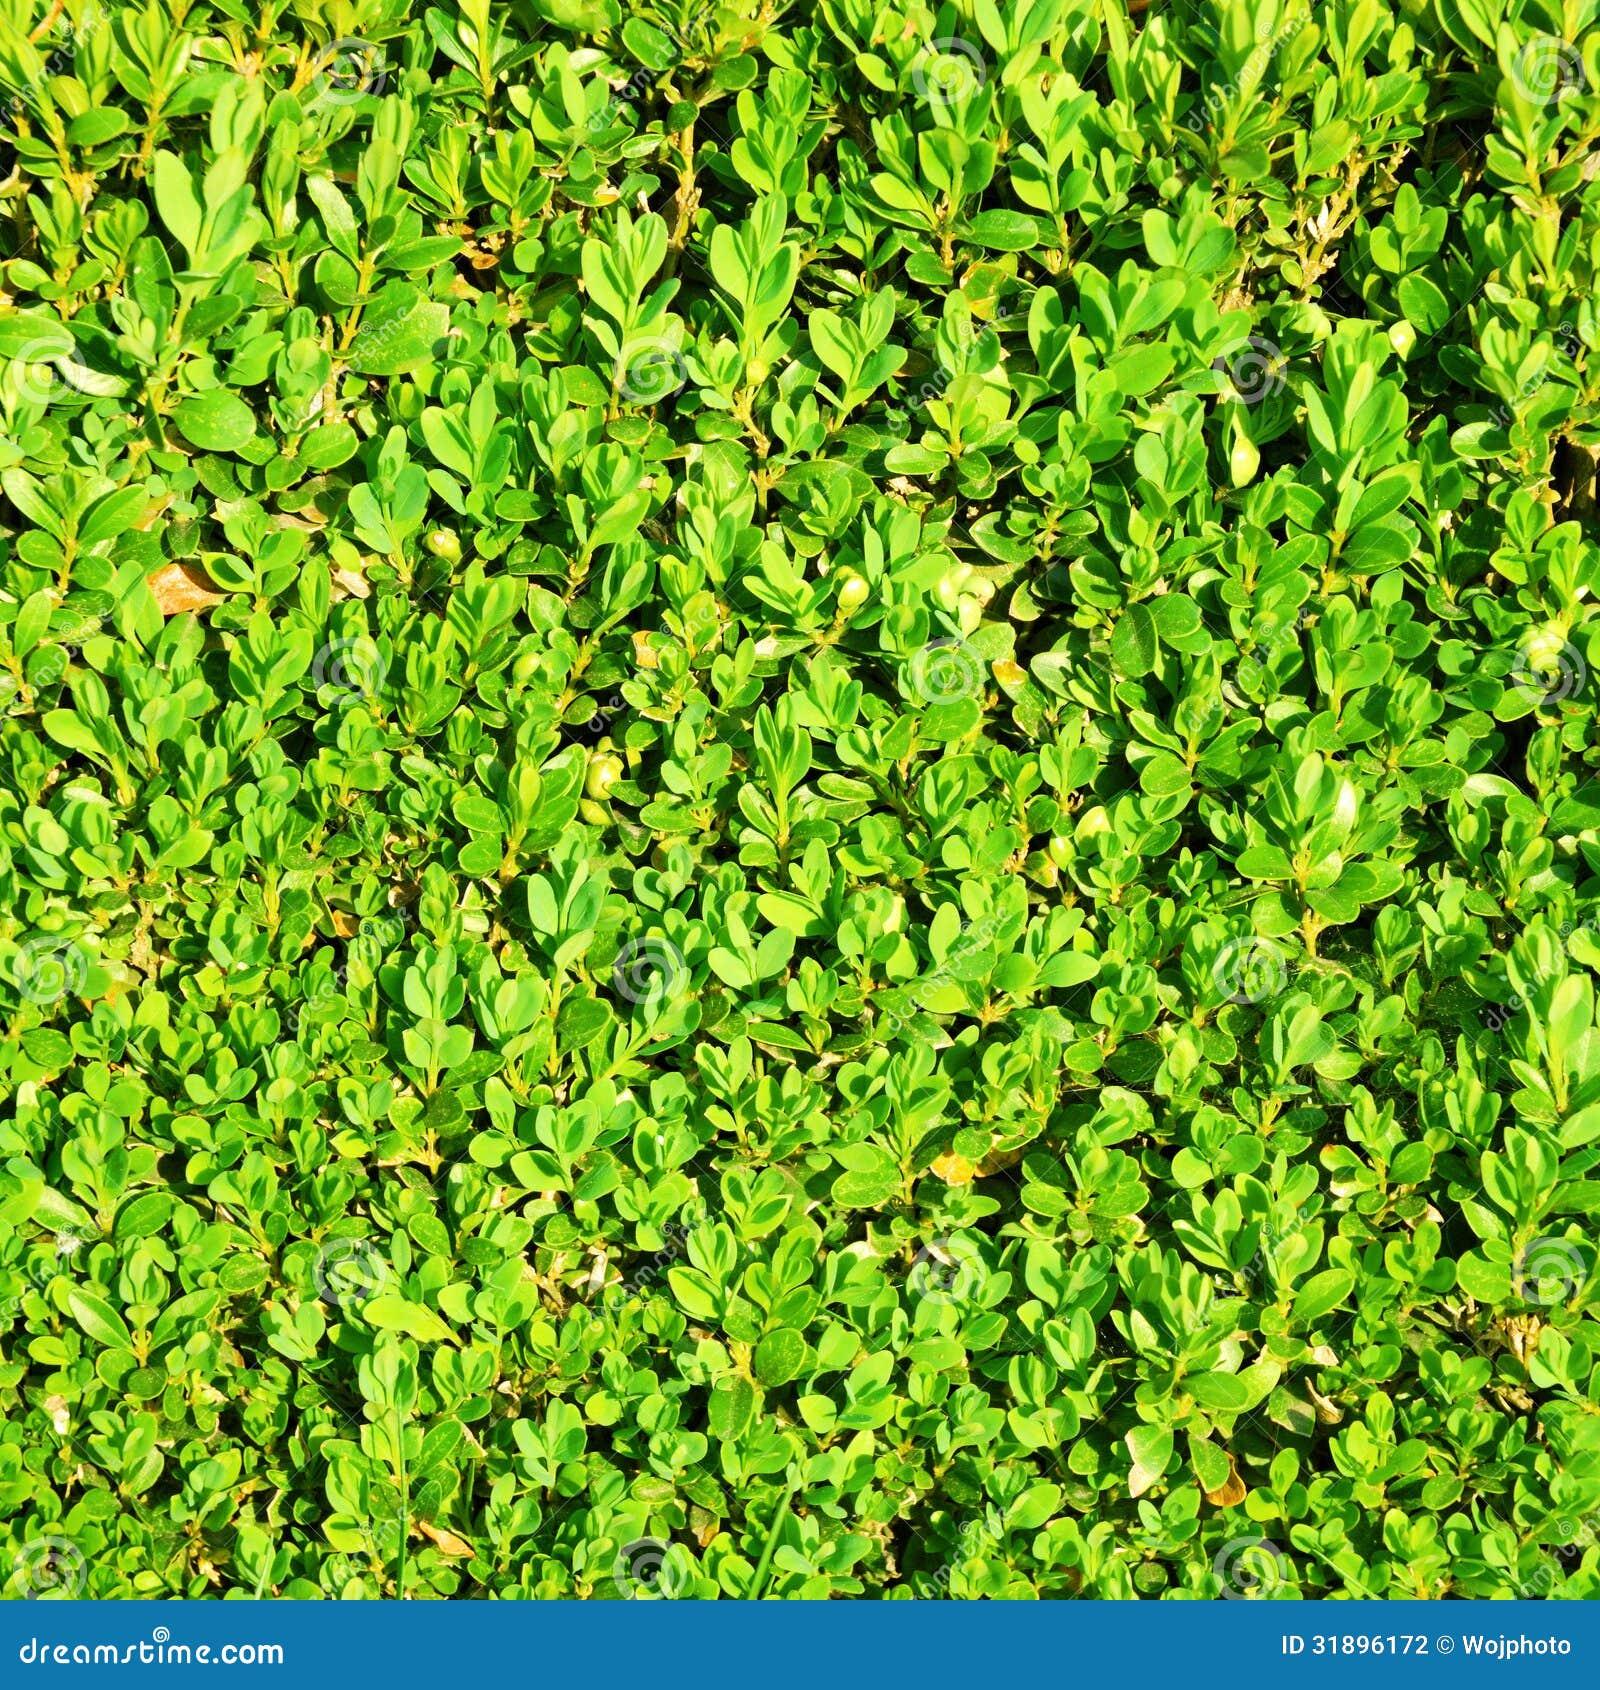 Green Hedge Bush Stock Photography - Image: 31896172